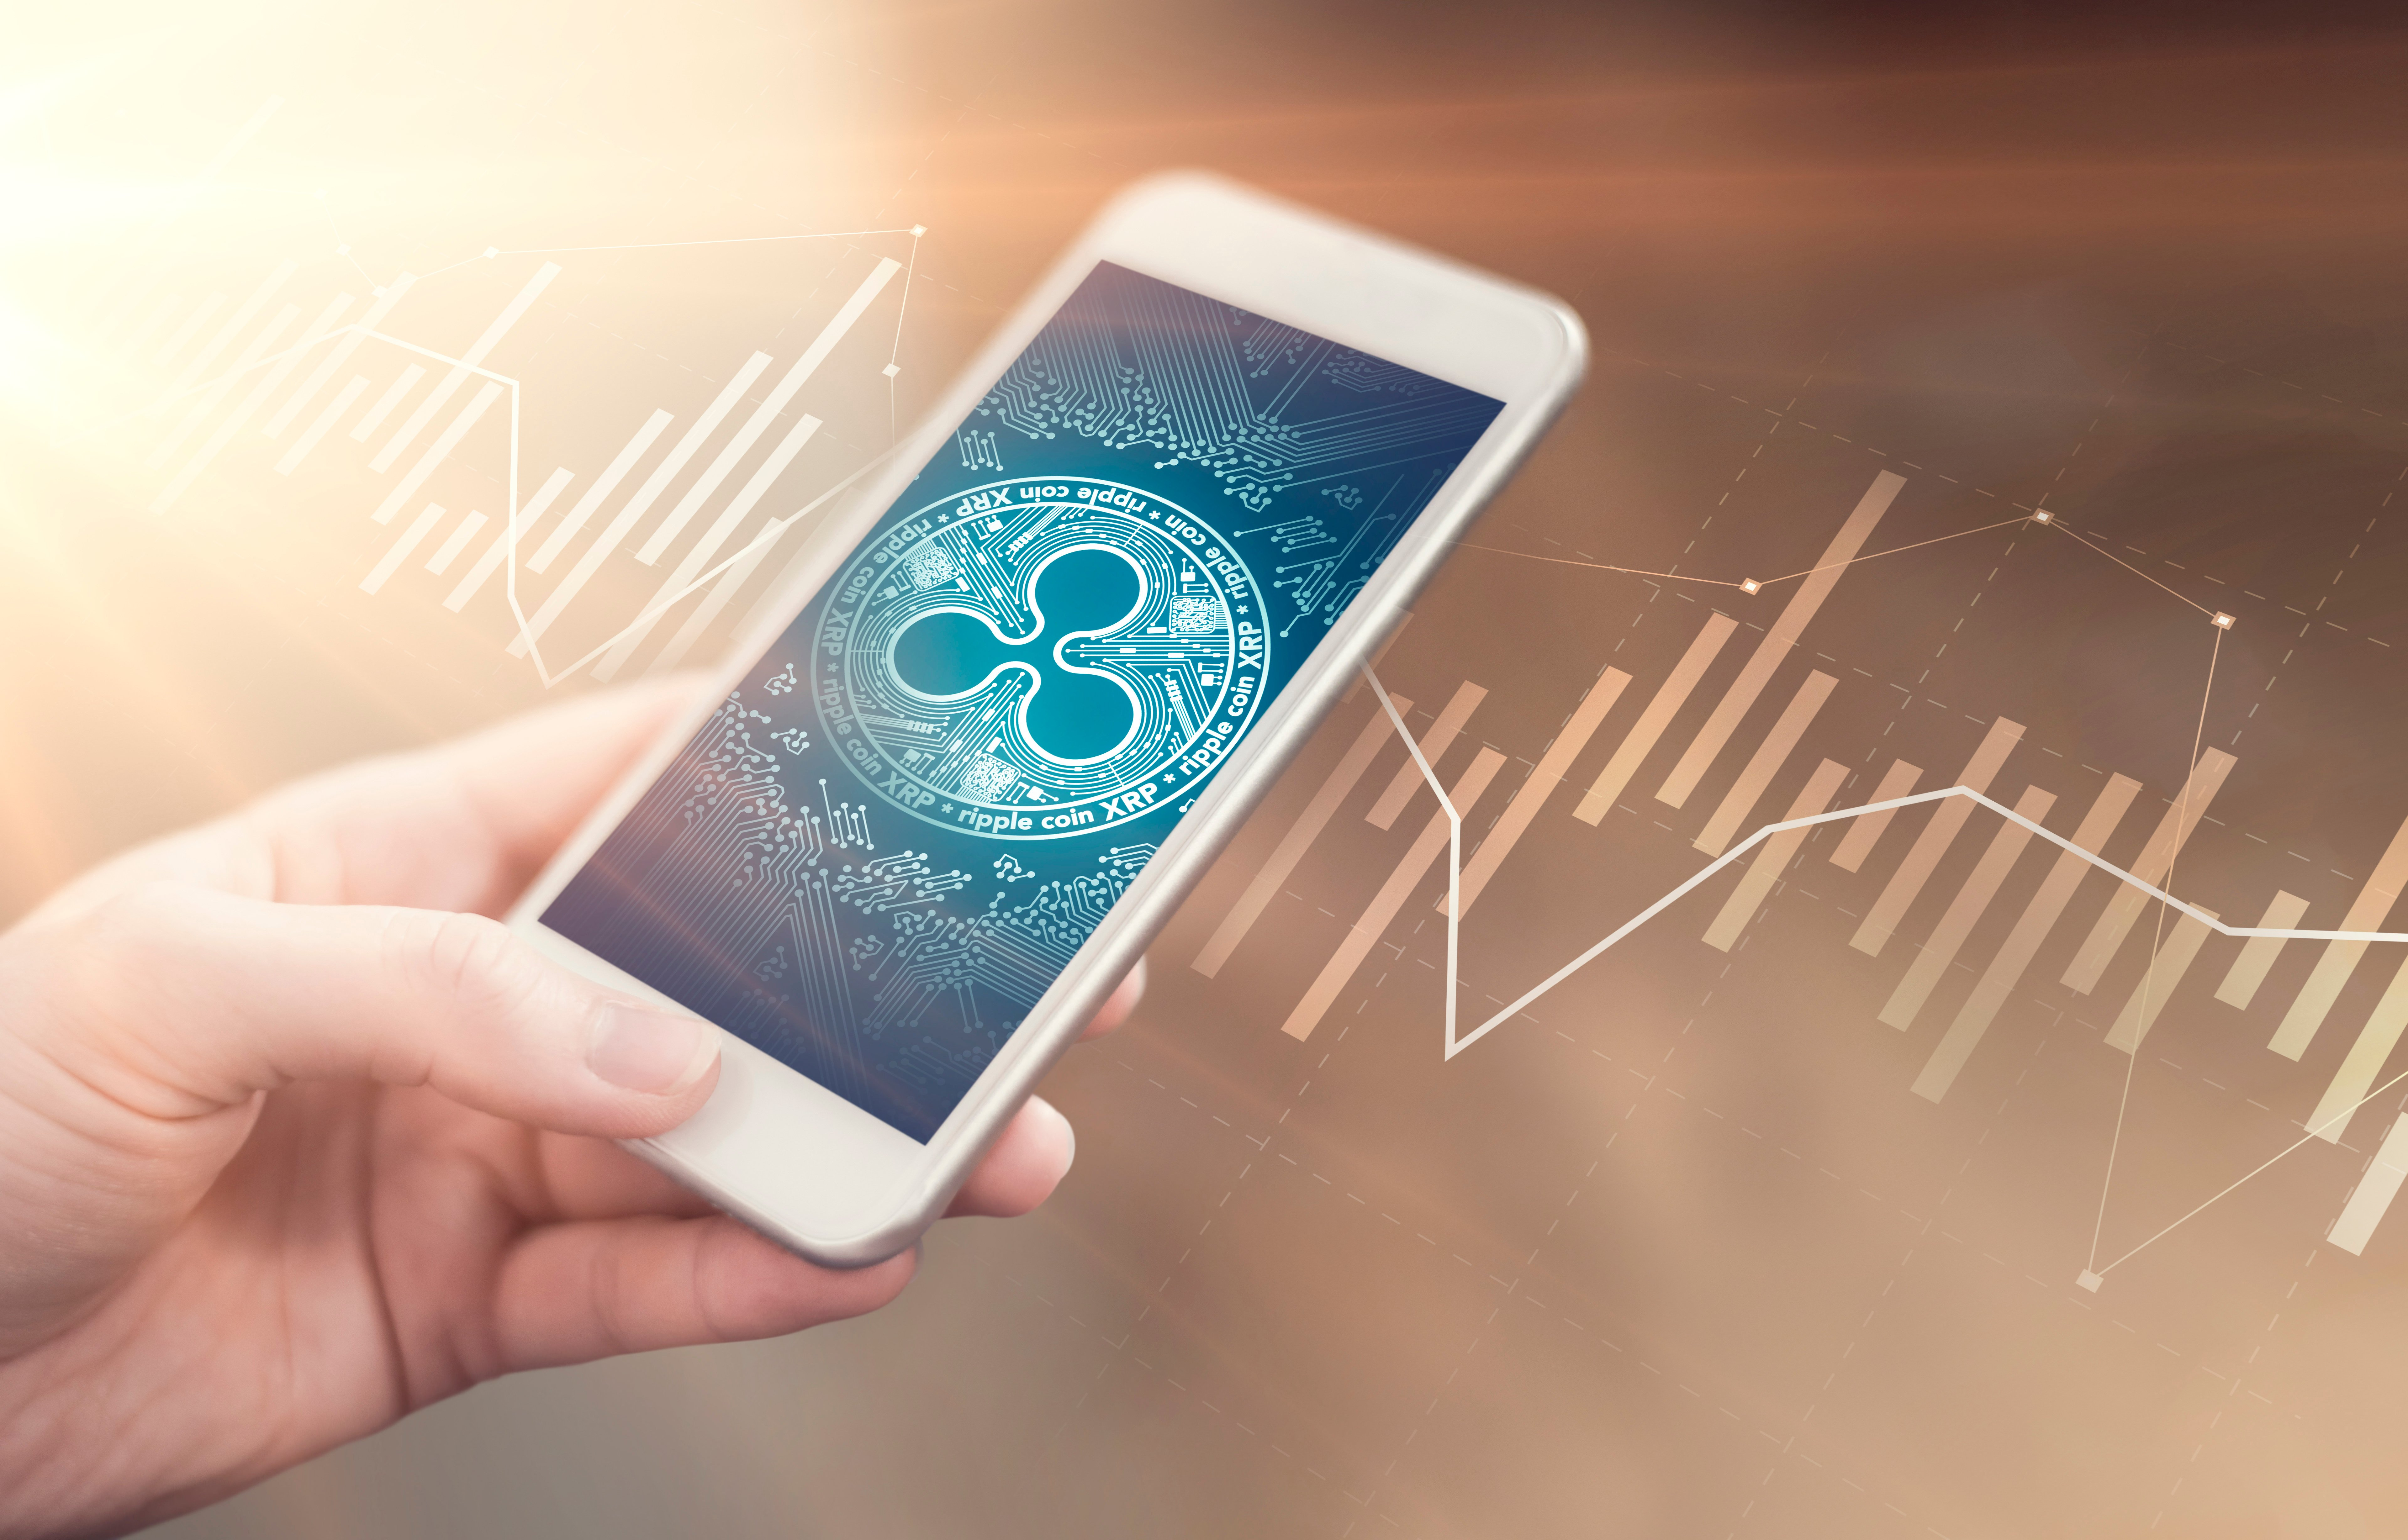 ripple logo on smartphone